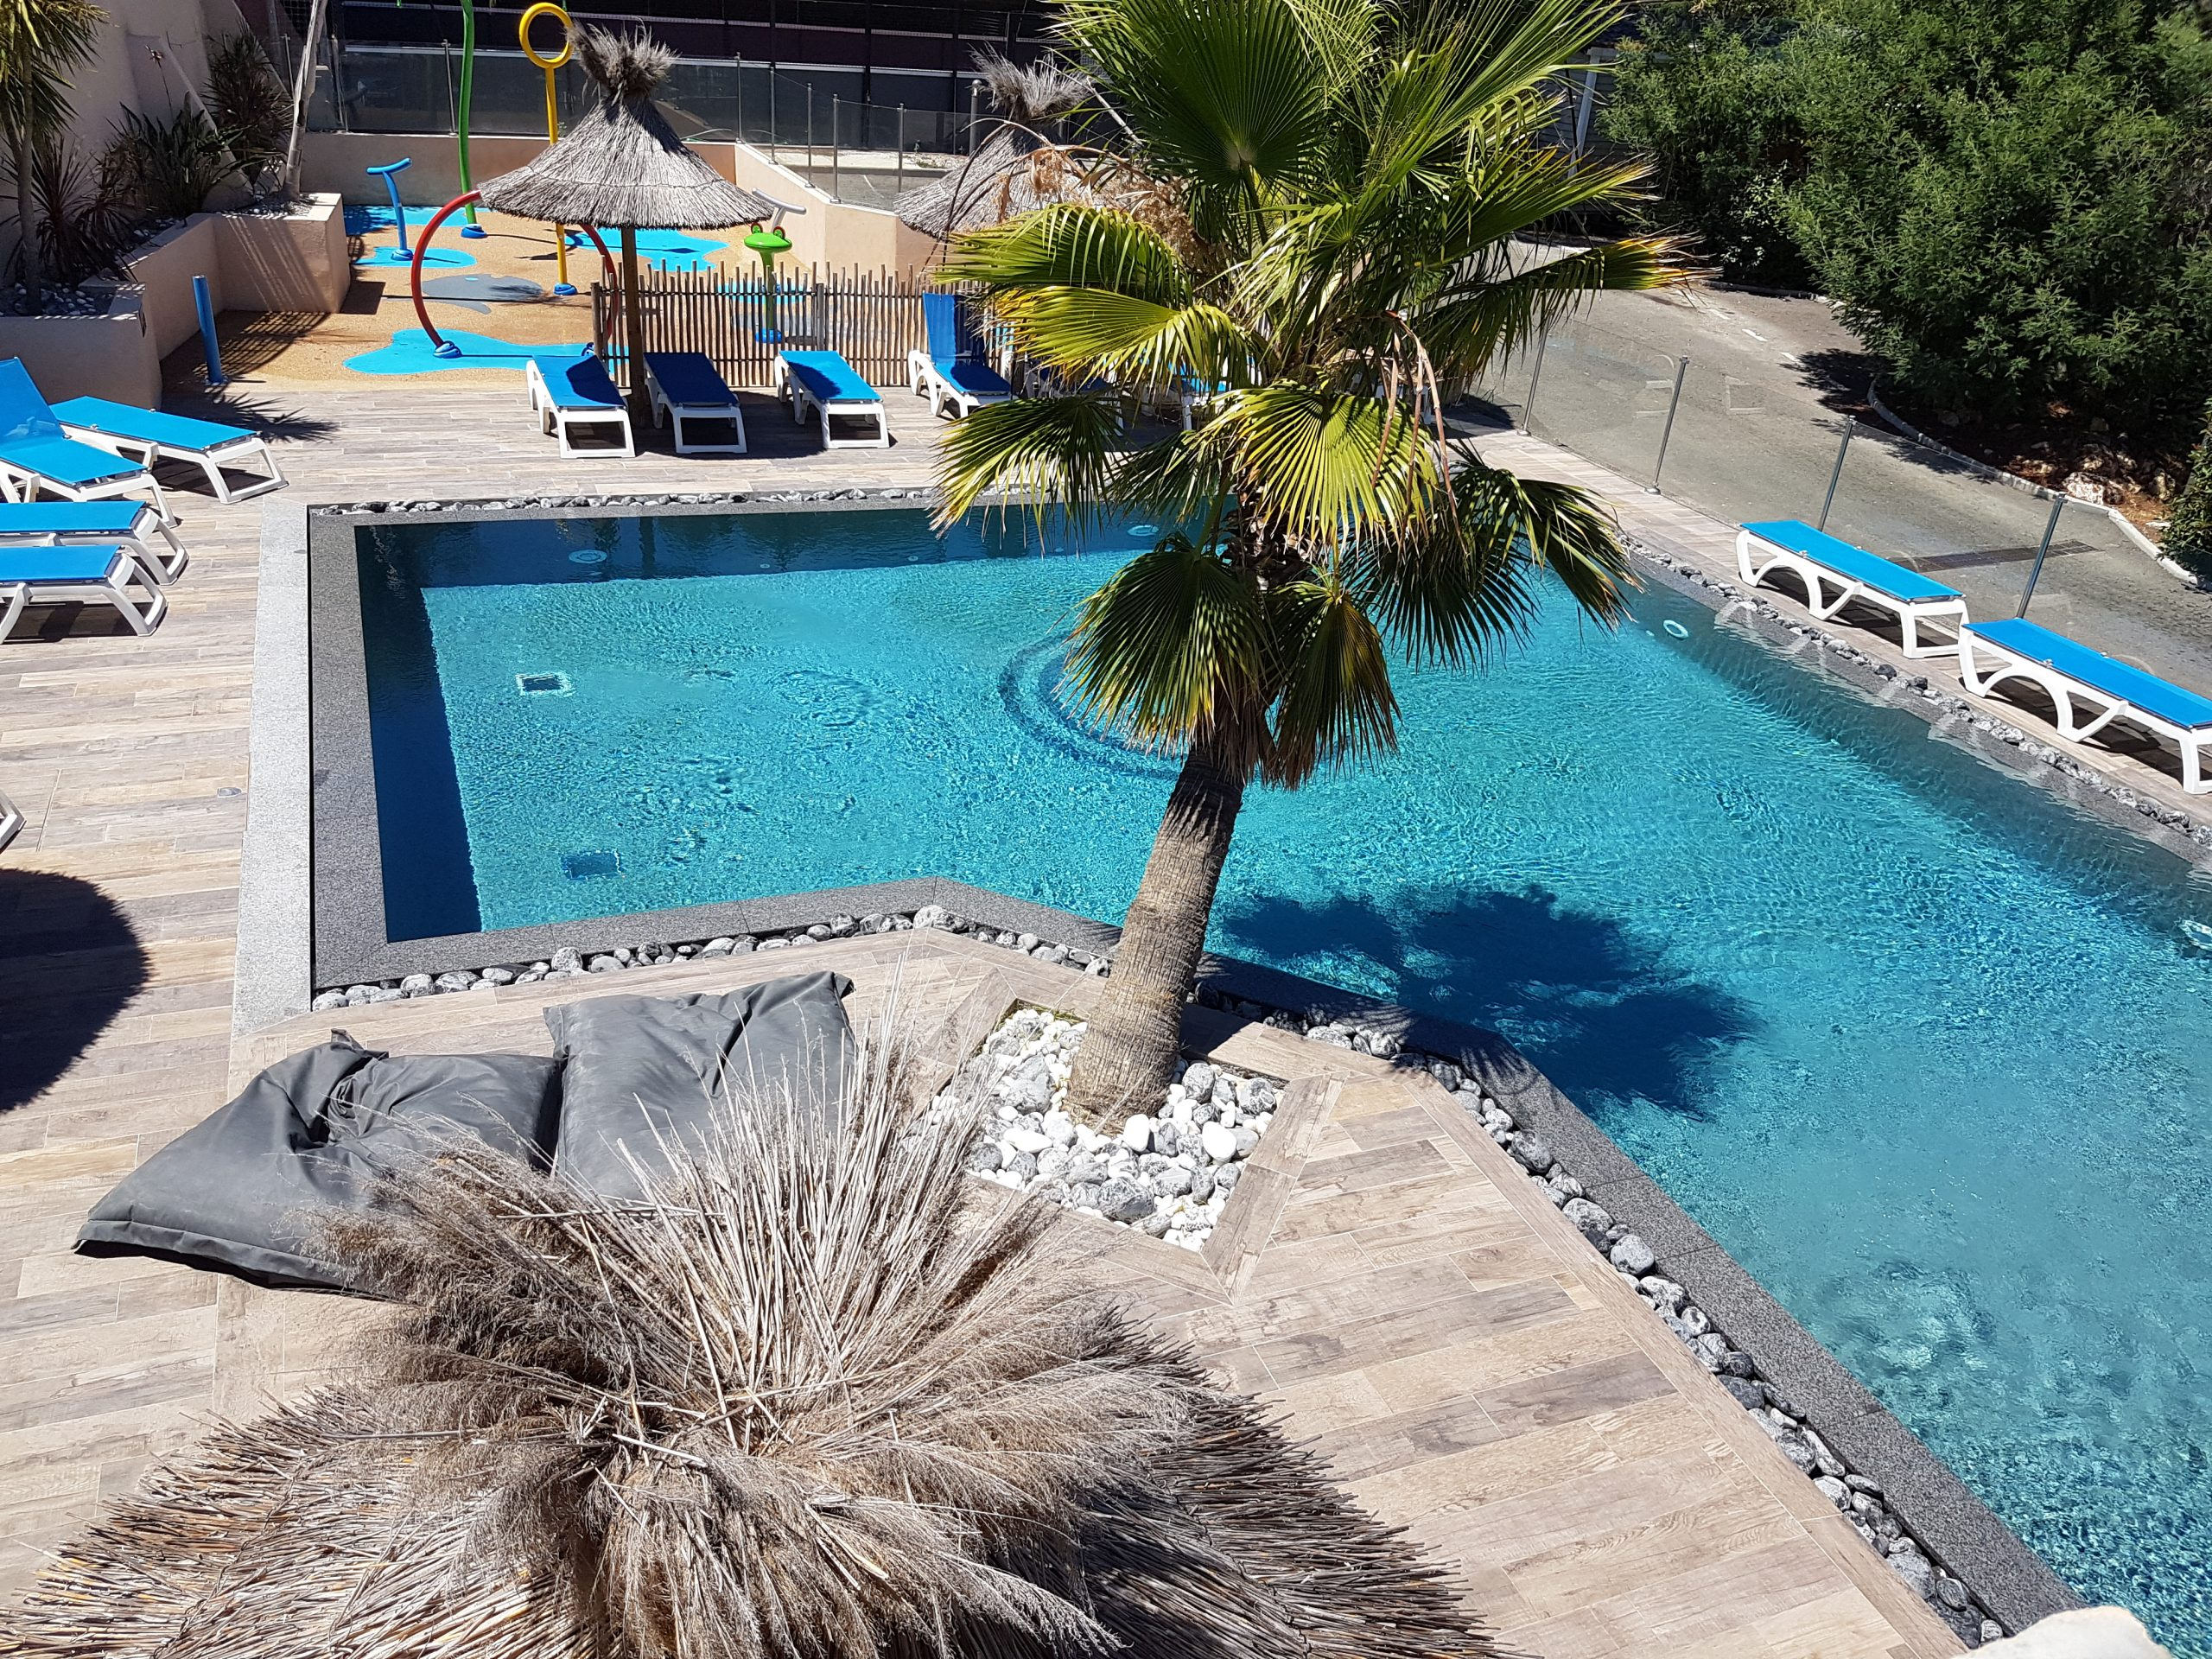 Campsite Ramatuelle With Pool | Cap Taillat | 4-Star Var tout Camping Var Avec Piscine